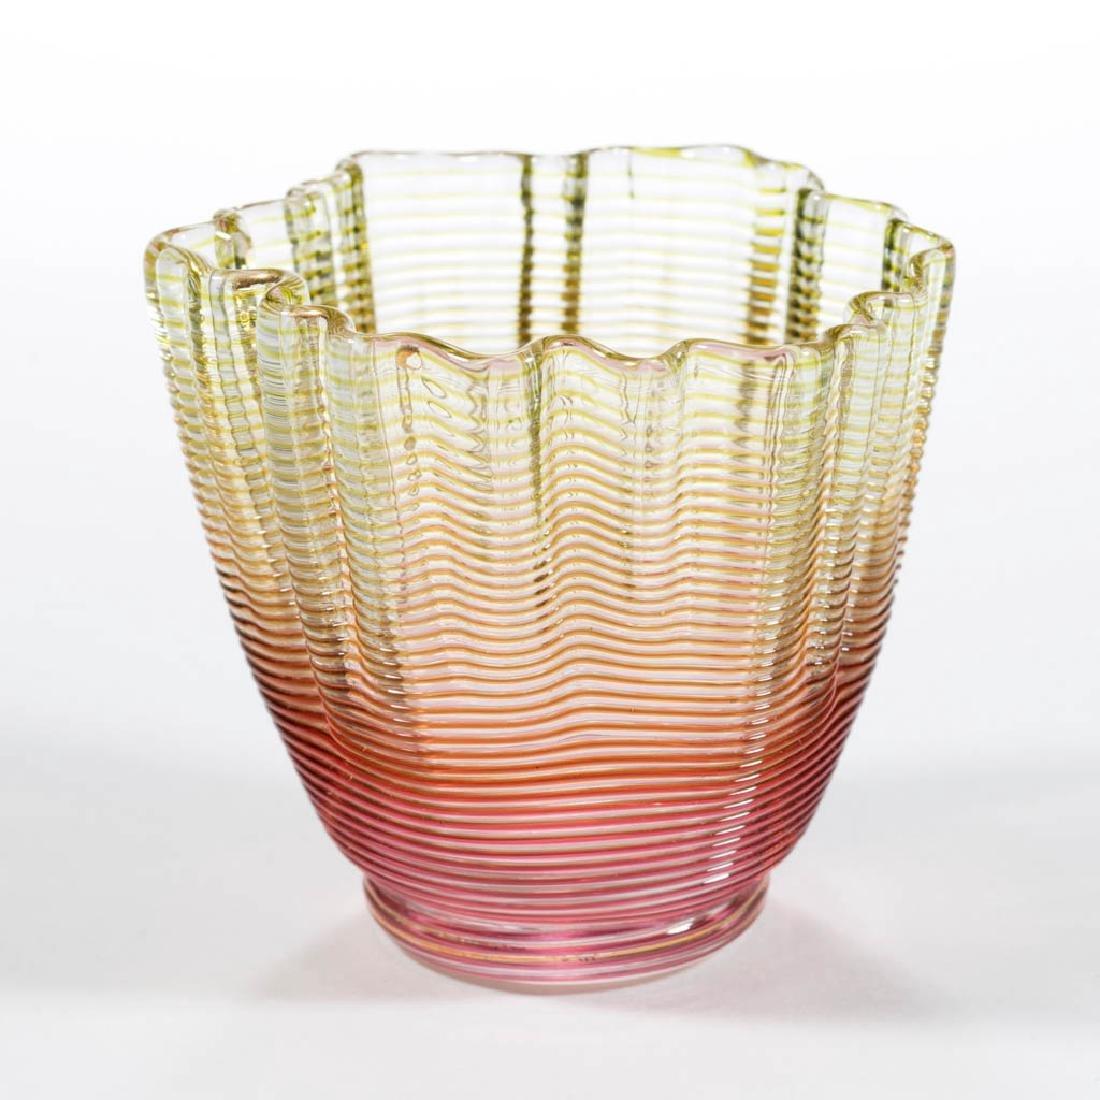 THREADED-GLASS TOOTHPICK HOLDER